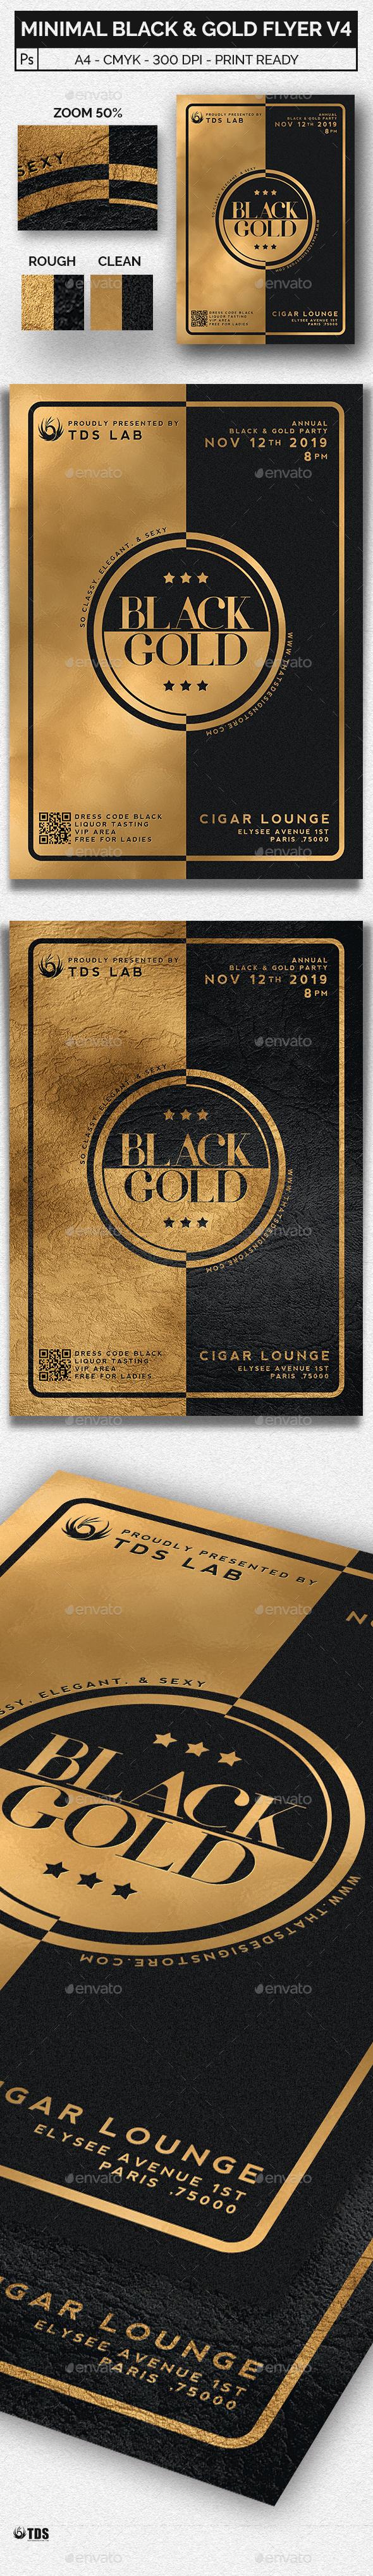 GraphicRiver Minimal Black and Gold Flyer Template V4 20465471